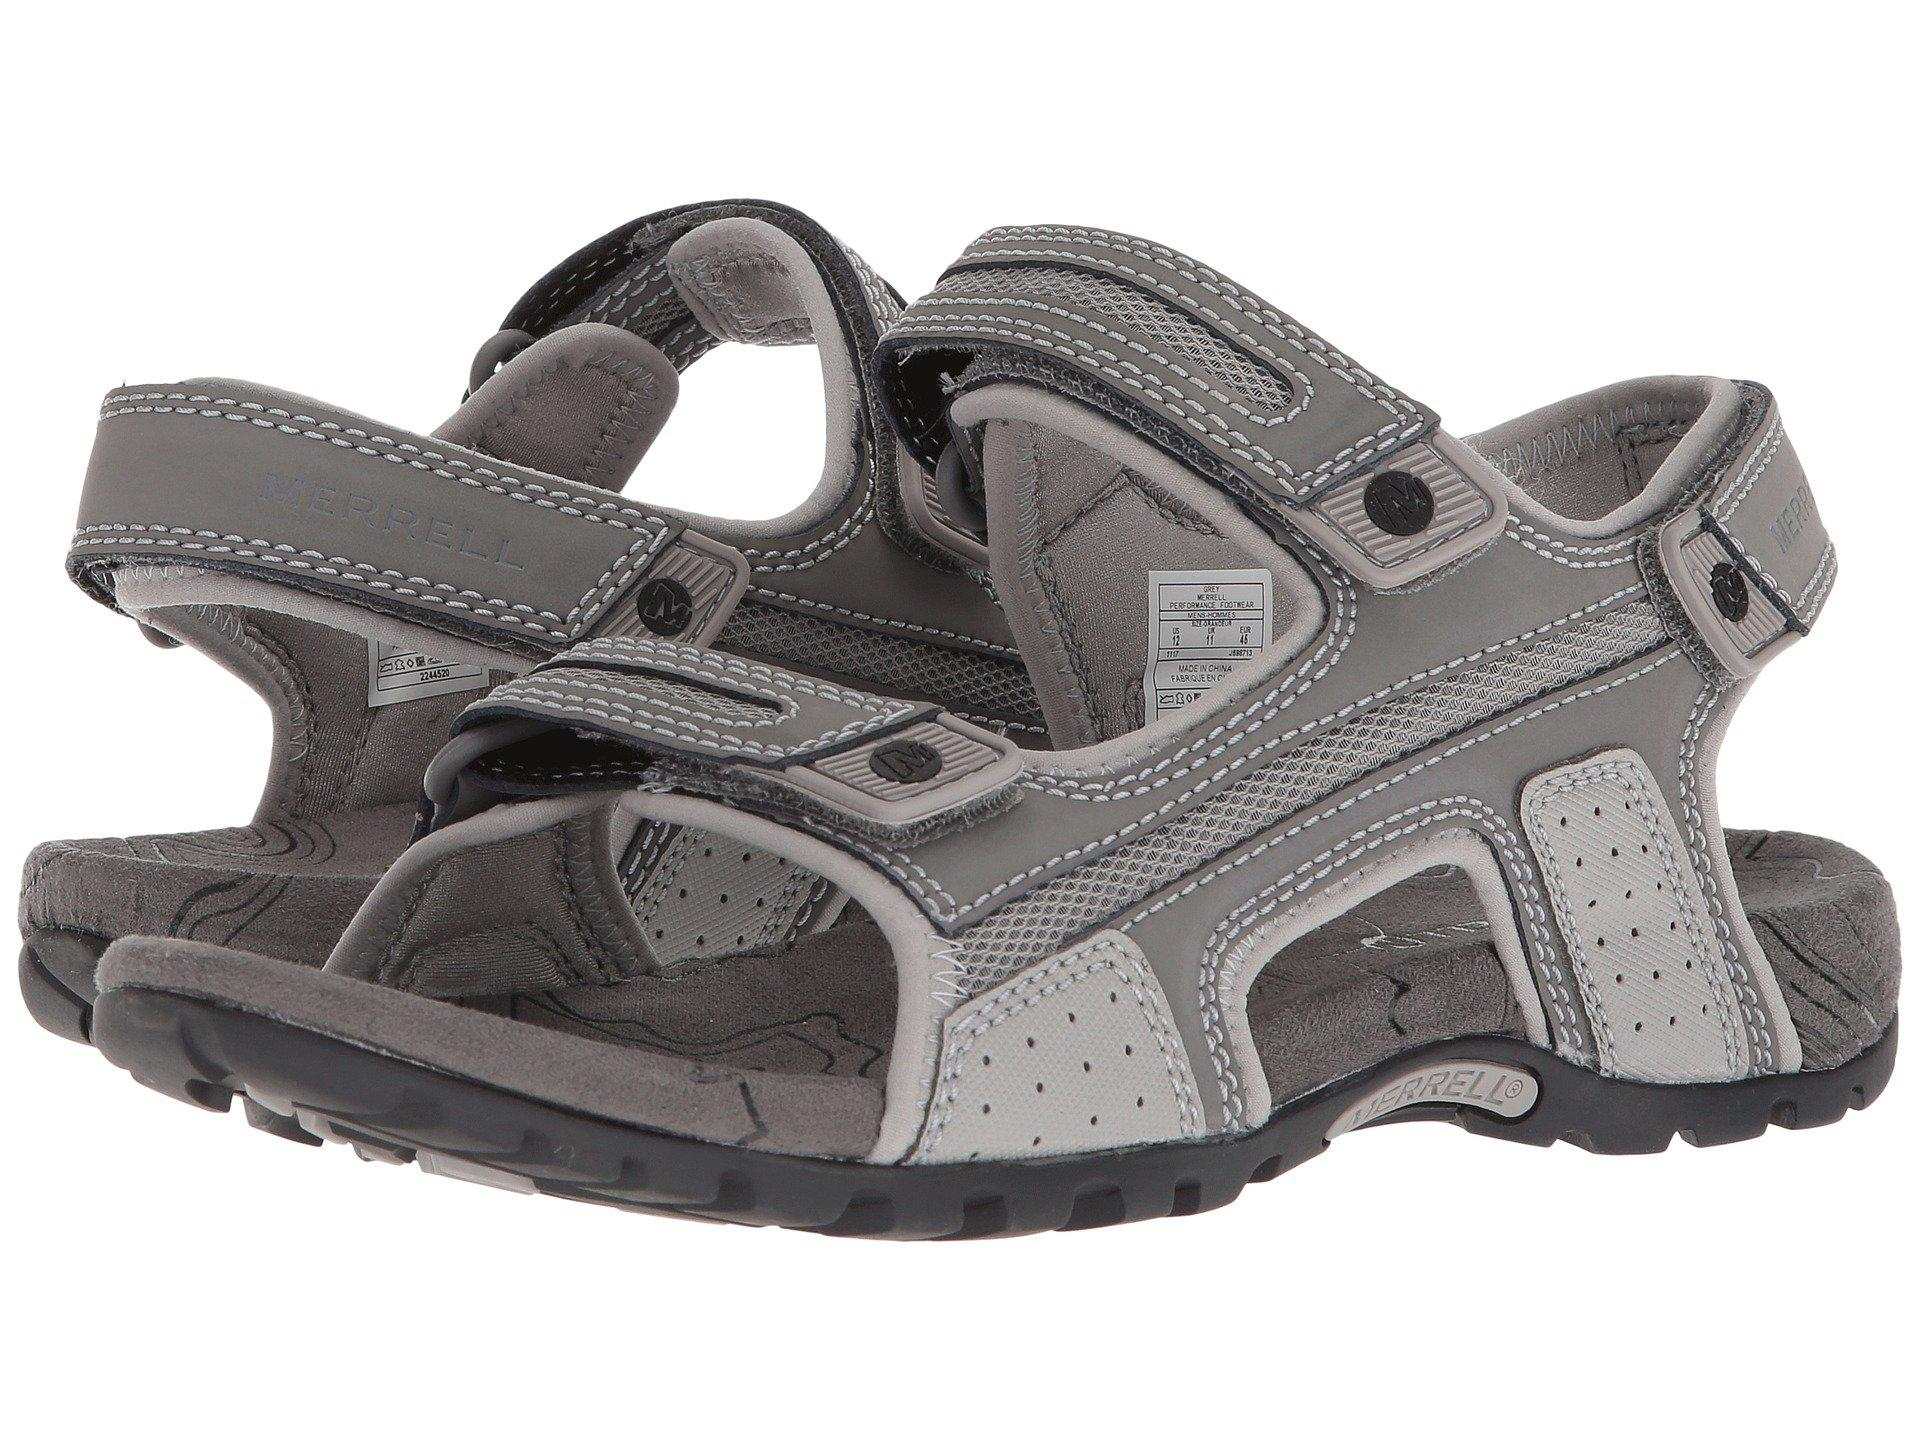 4c59265a2bc5 Lyst - Merrell Sandspur Oak (grey) Men s Shoes in Gray for Men